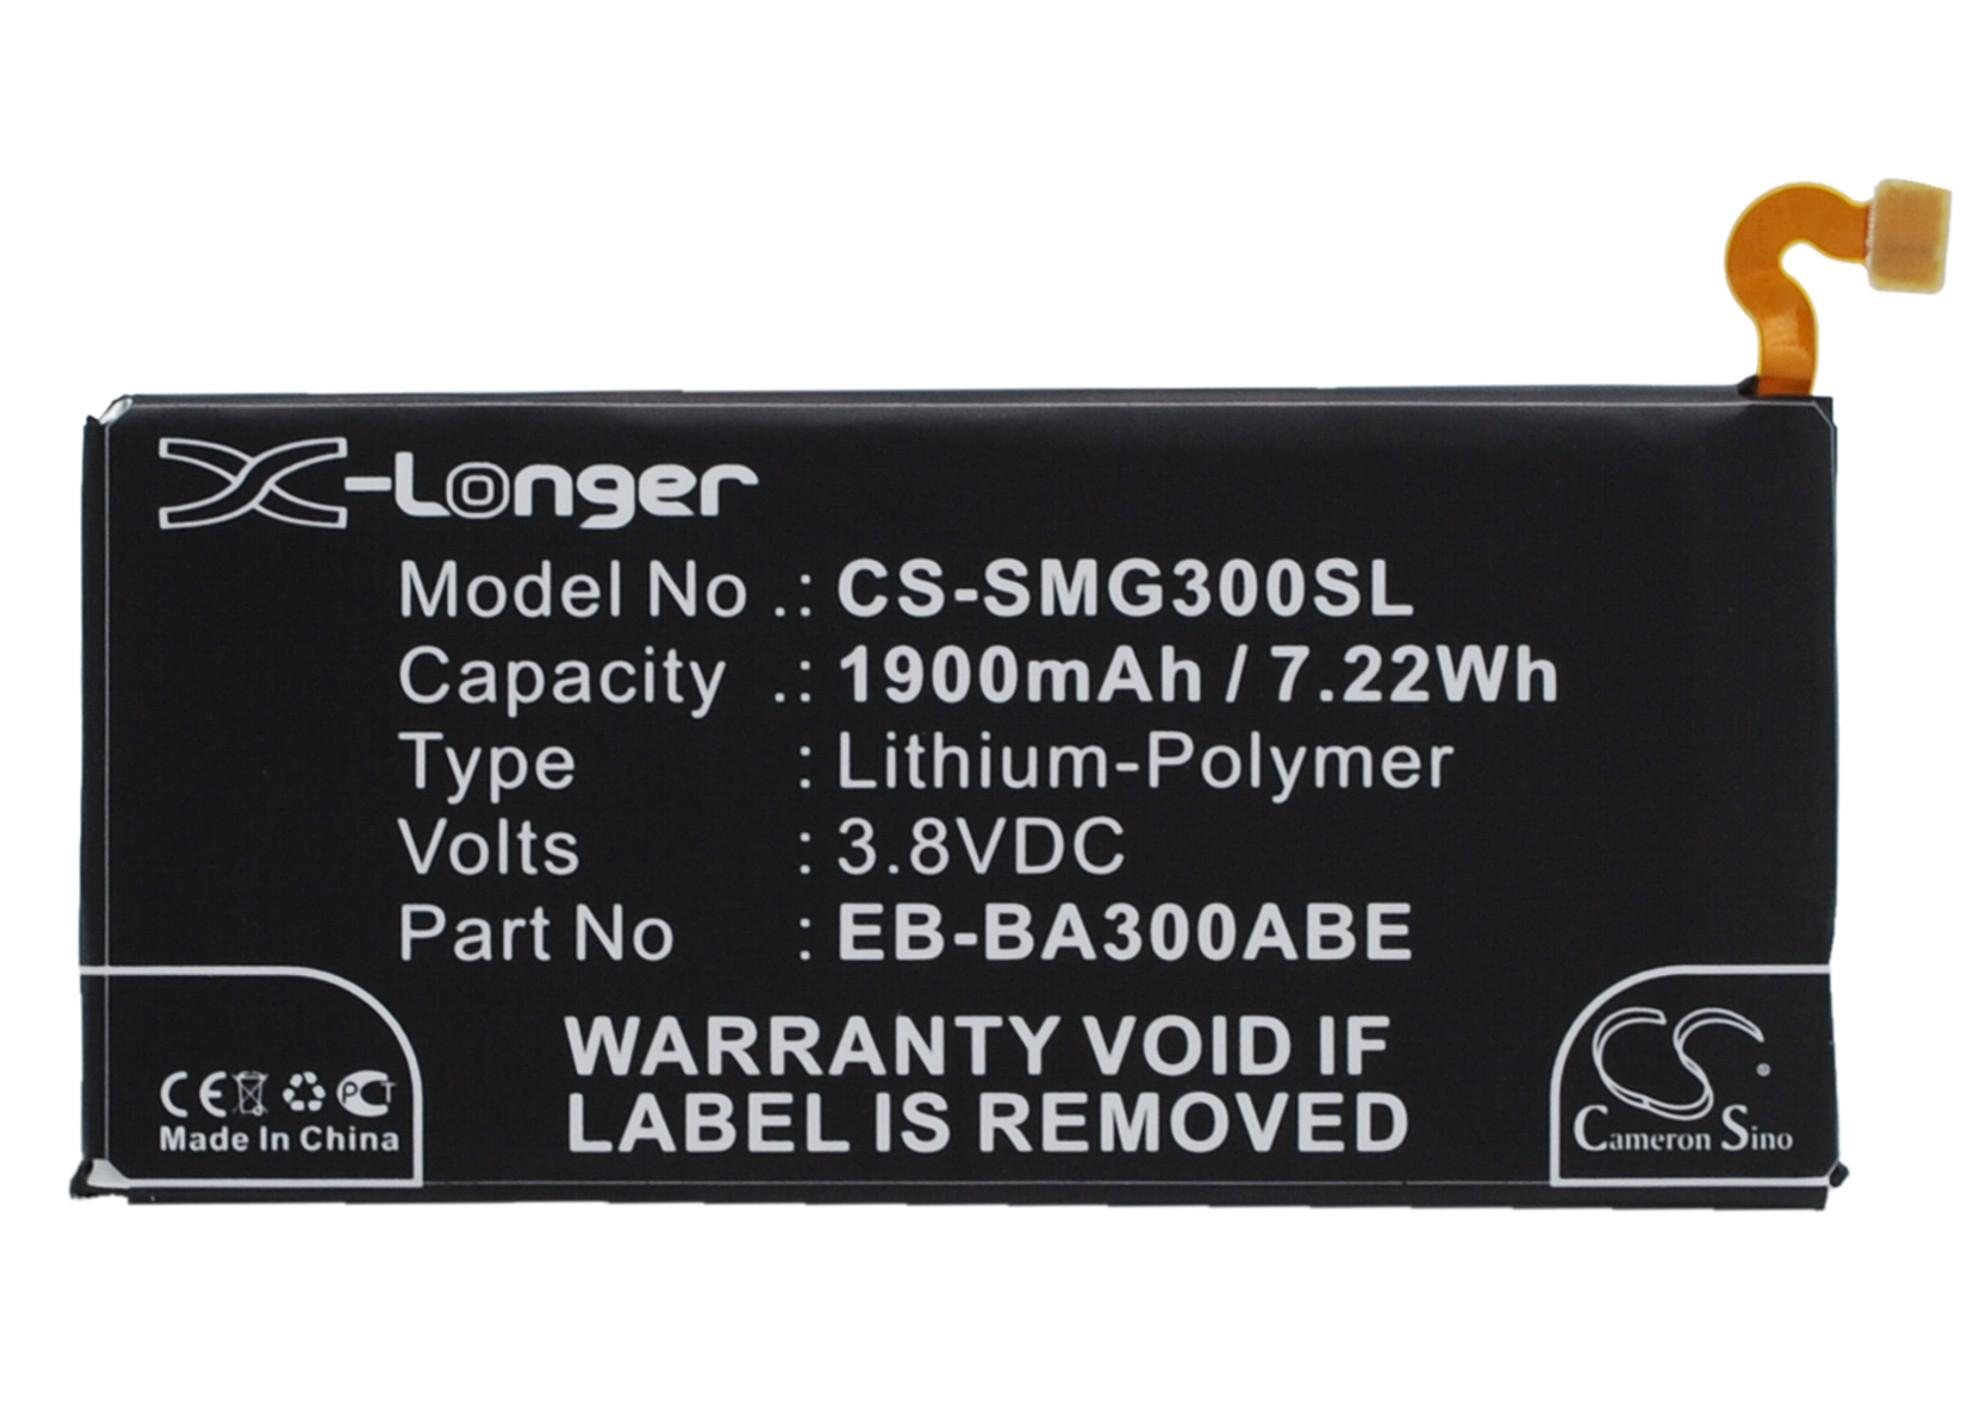 Cameron Sino baterie do mobilů pro SAMSUNG SM-A300F 3.8V Li-Polymer 1900mAh černá - neoriginální